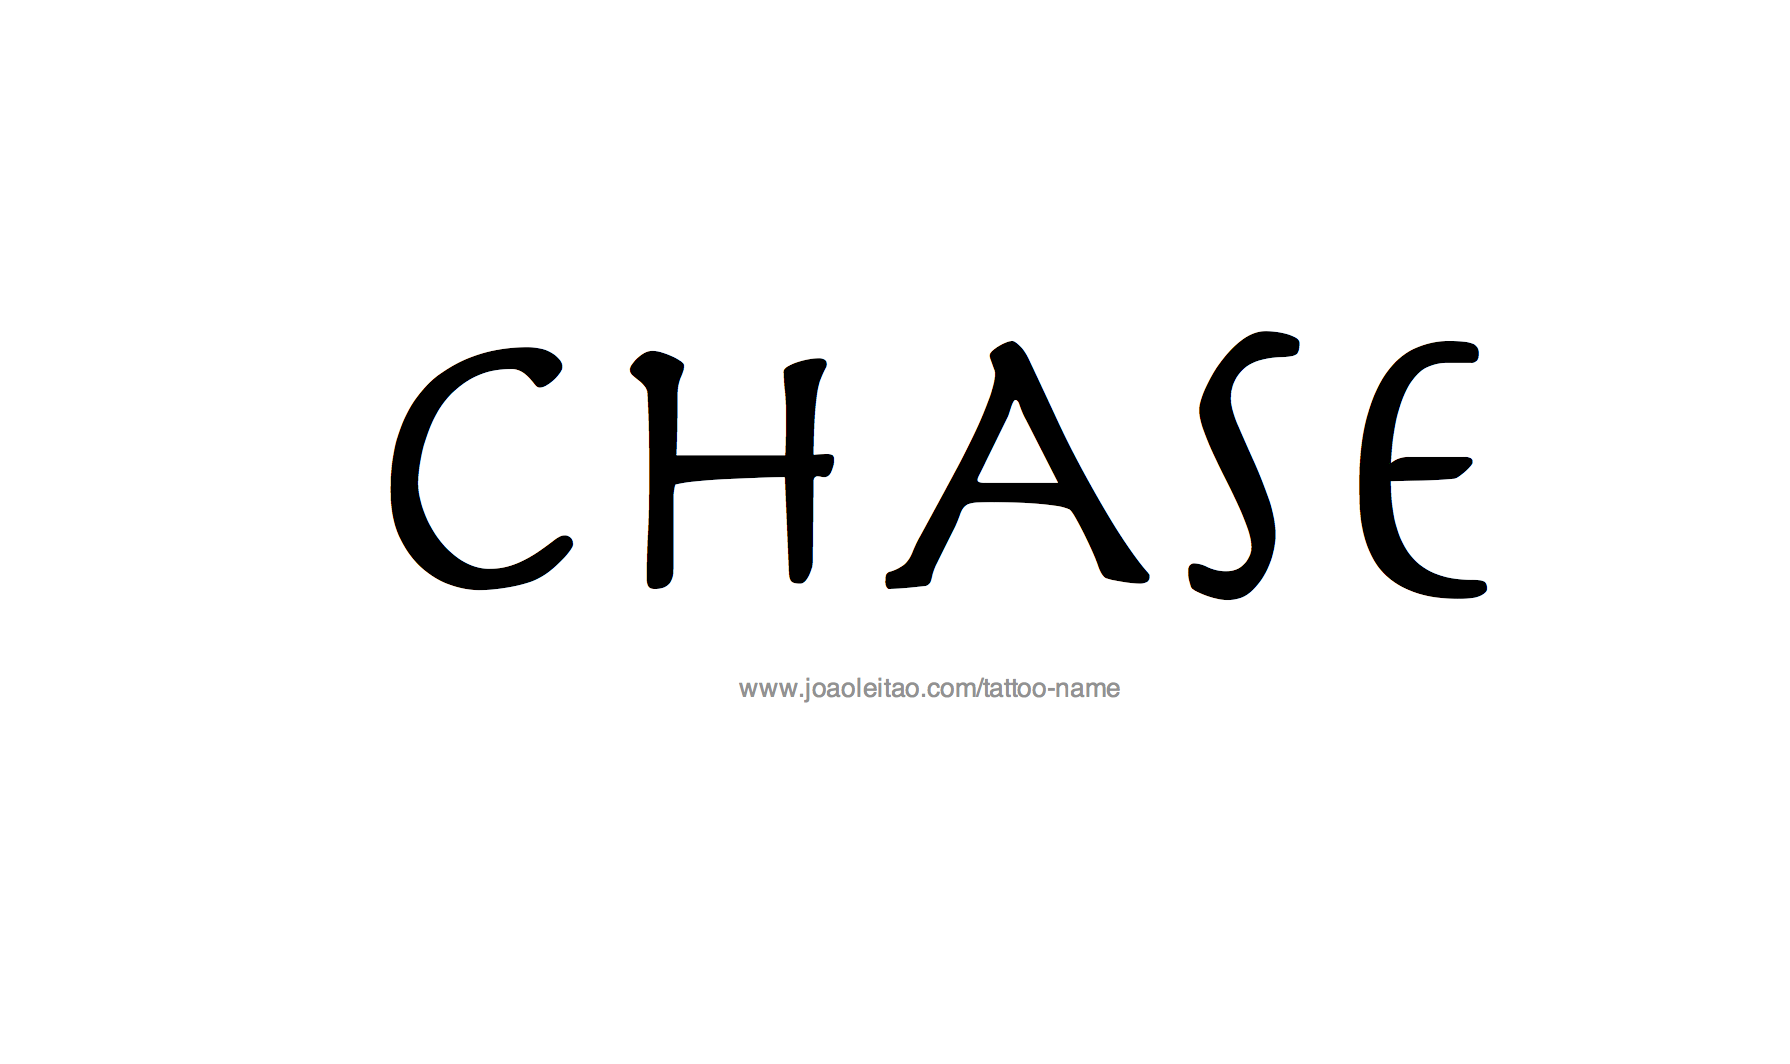 Tattoo Design Name Chase